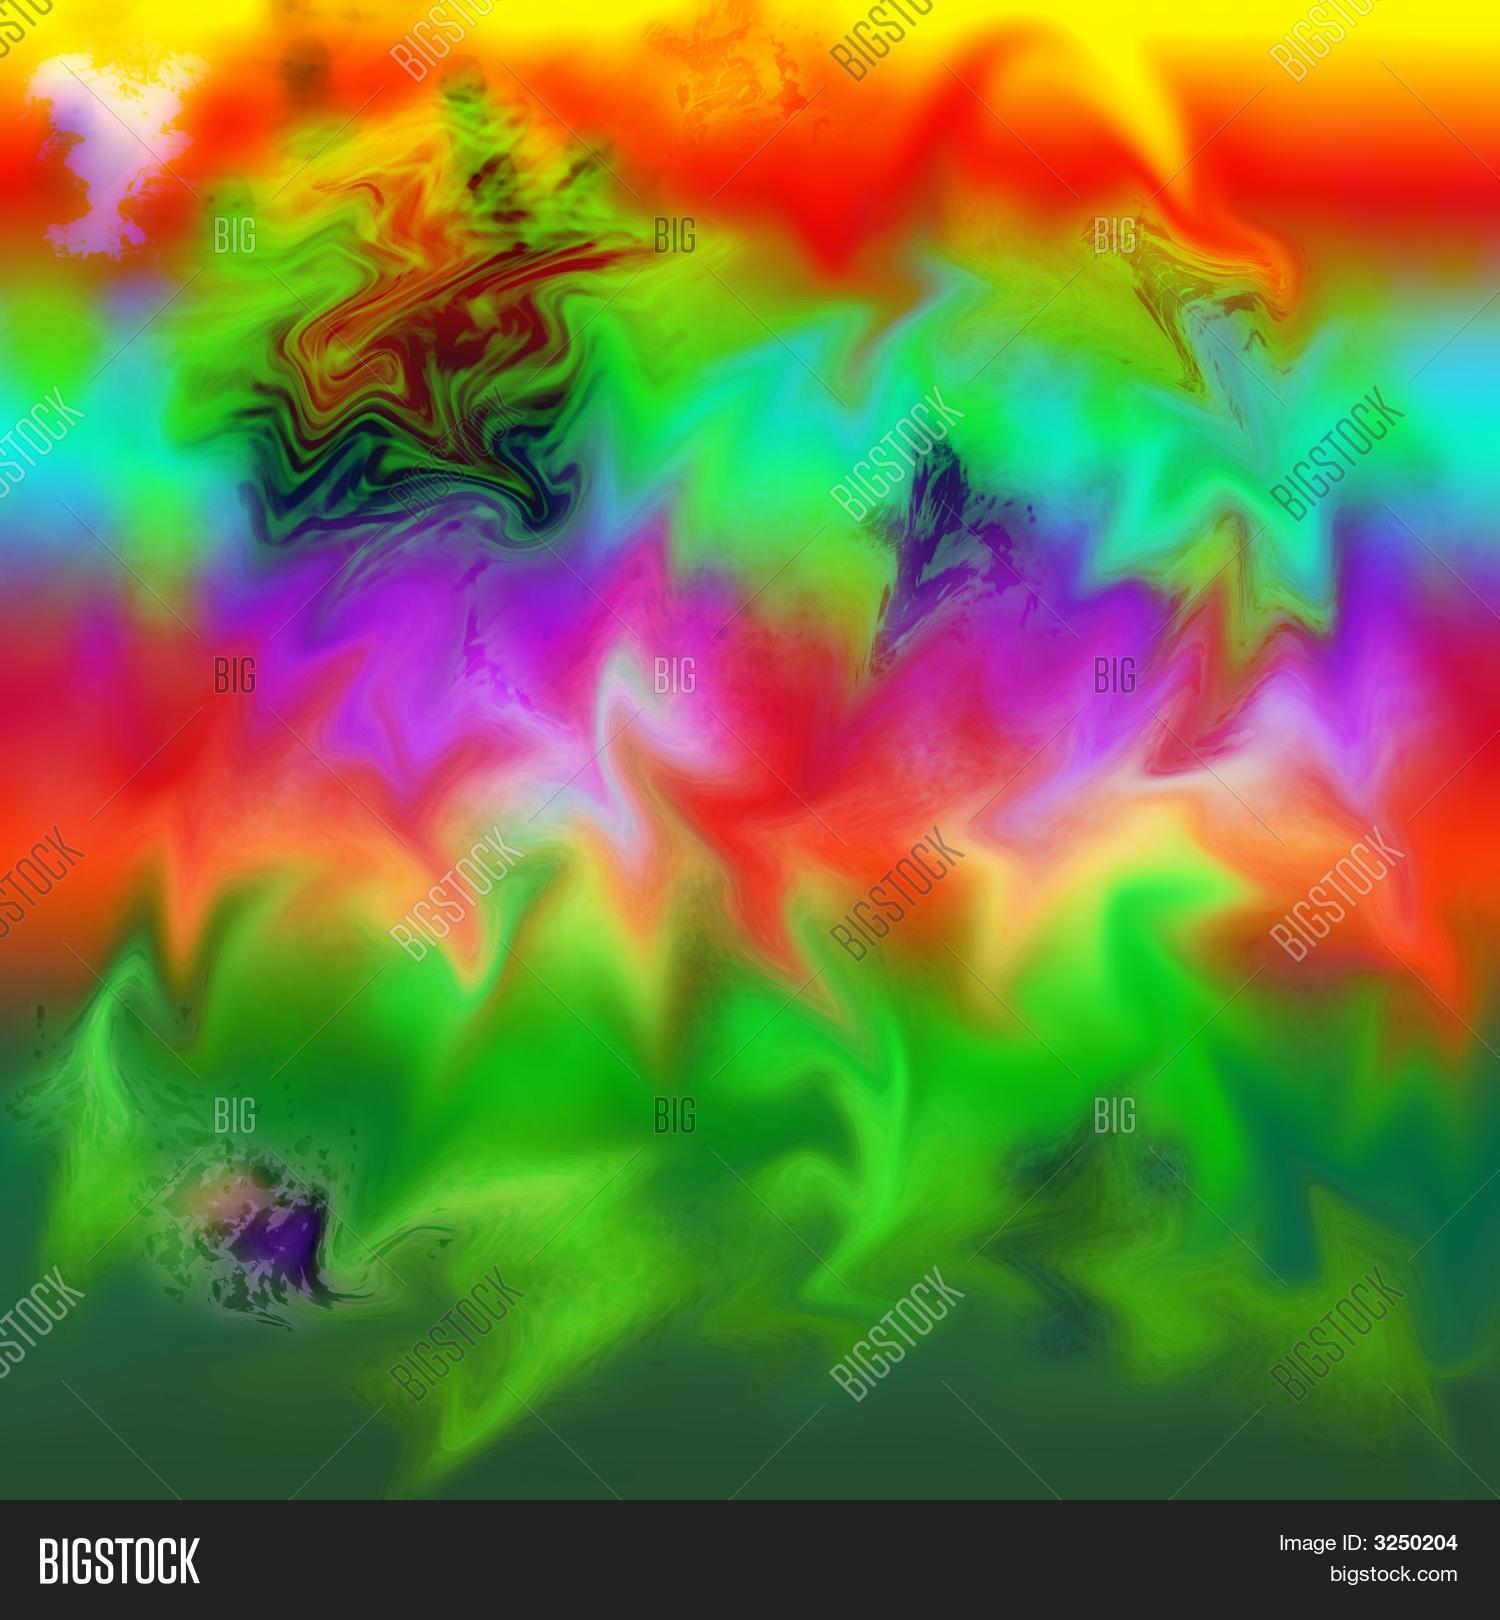 0cb2c8ace Tie Dye Background Image & Photo (Free Trial)   Bigstock